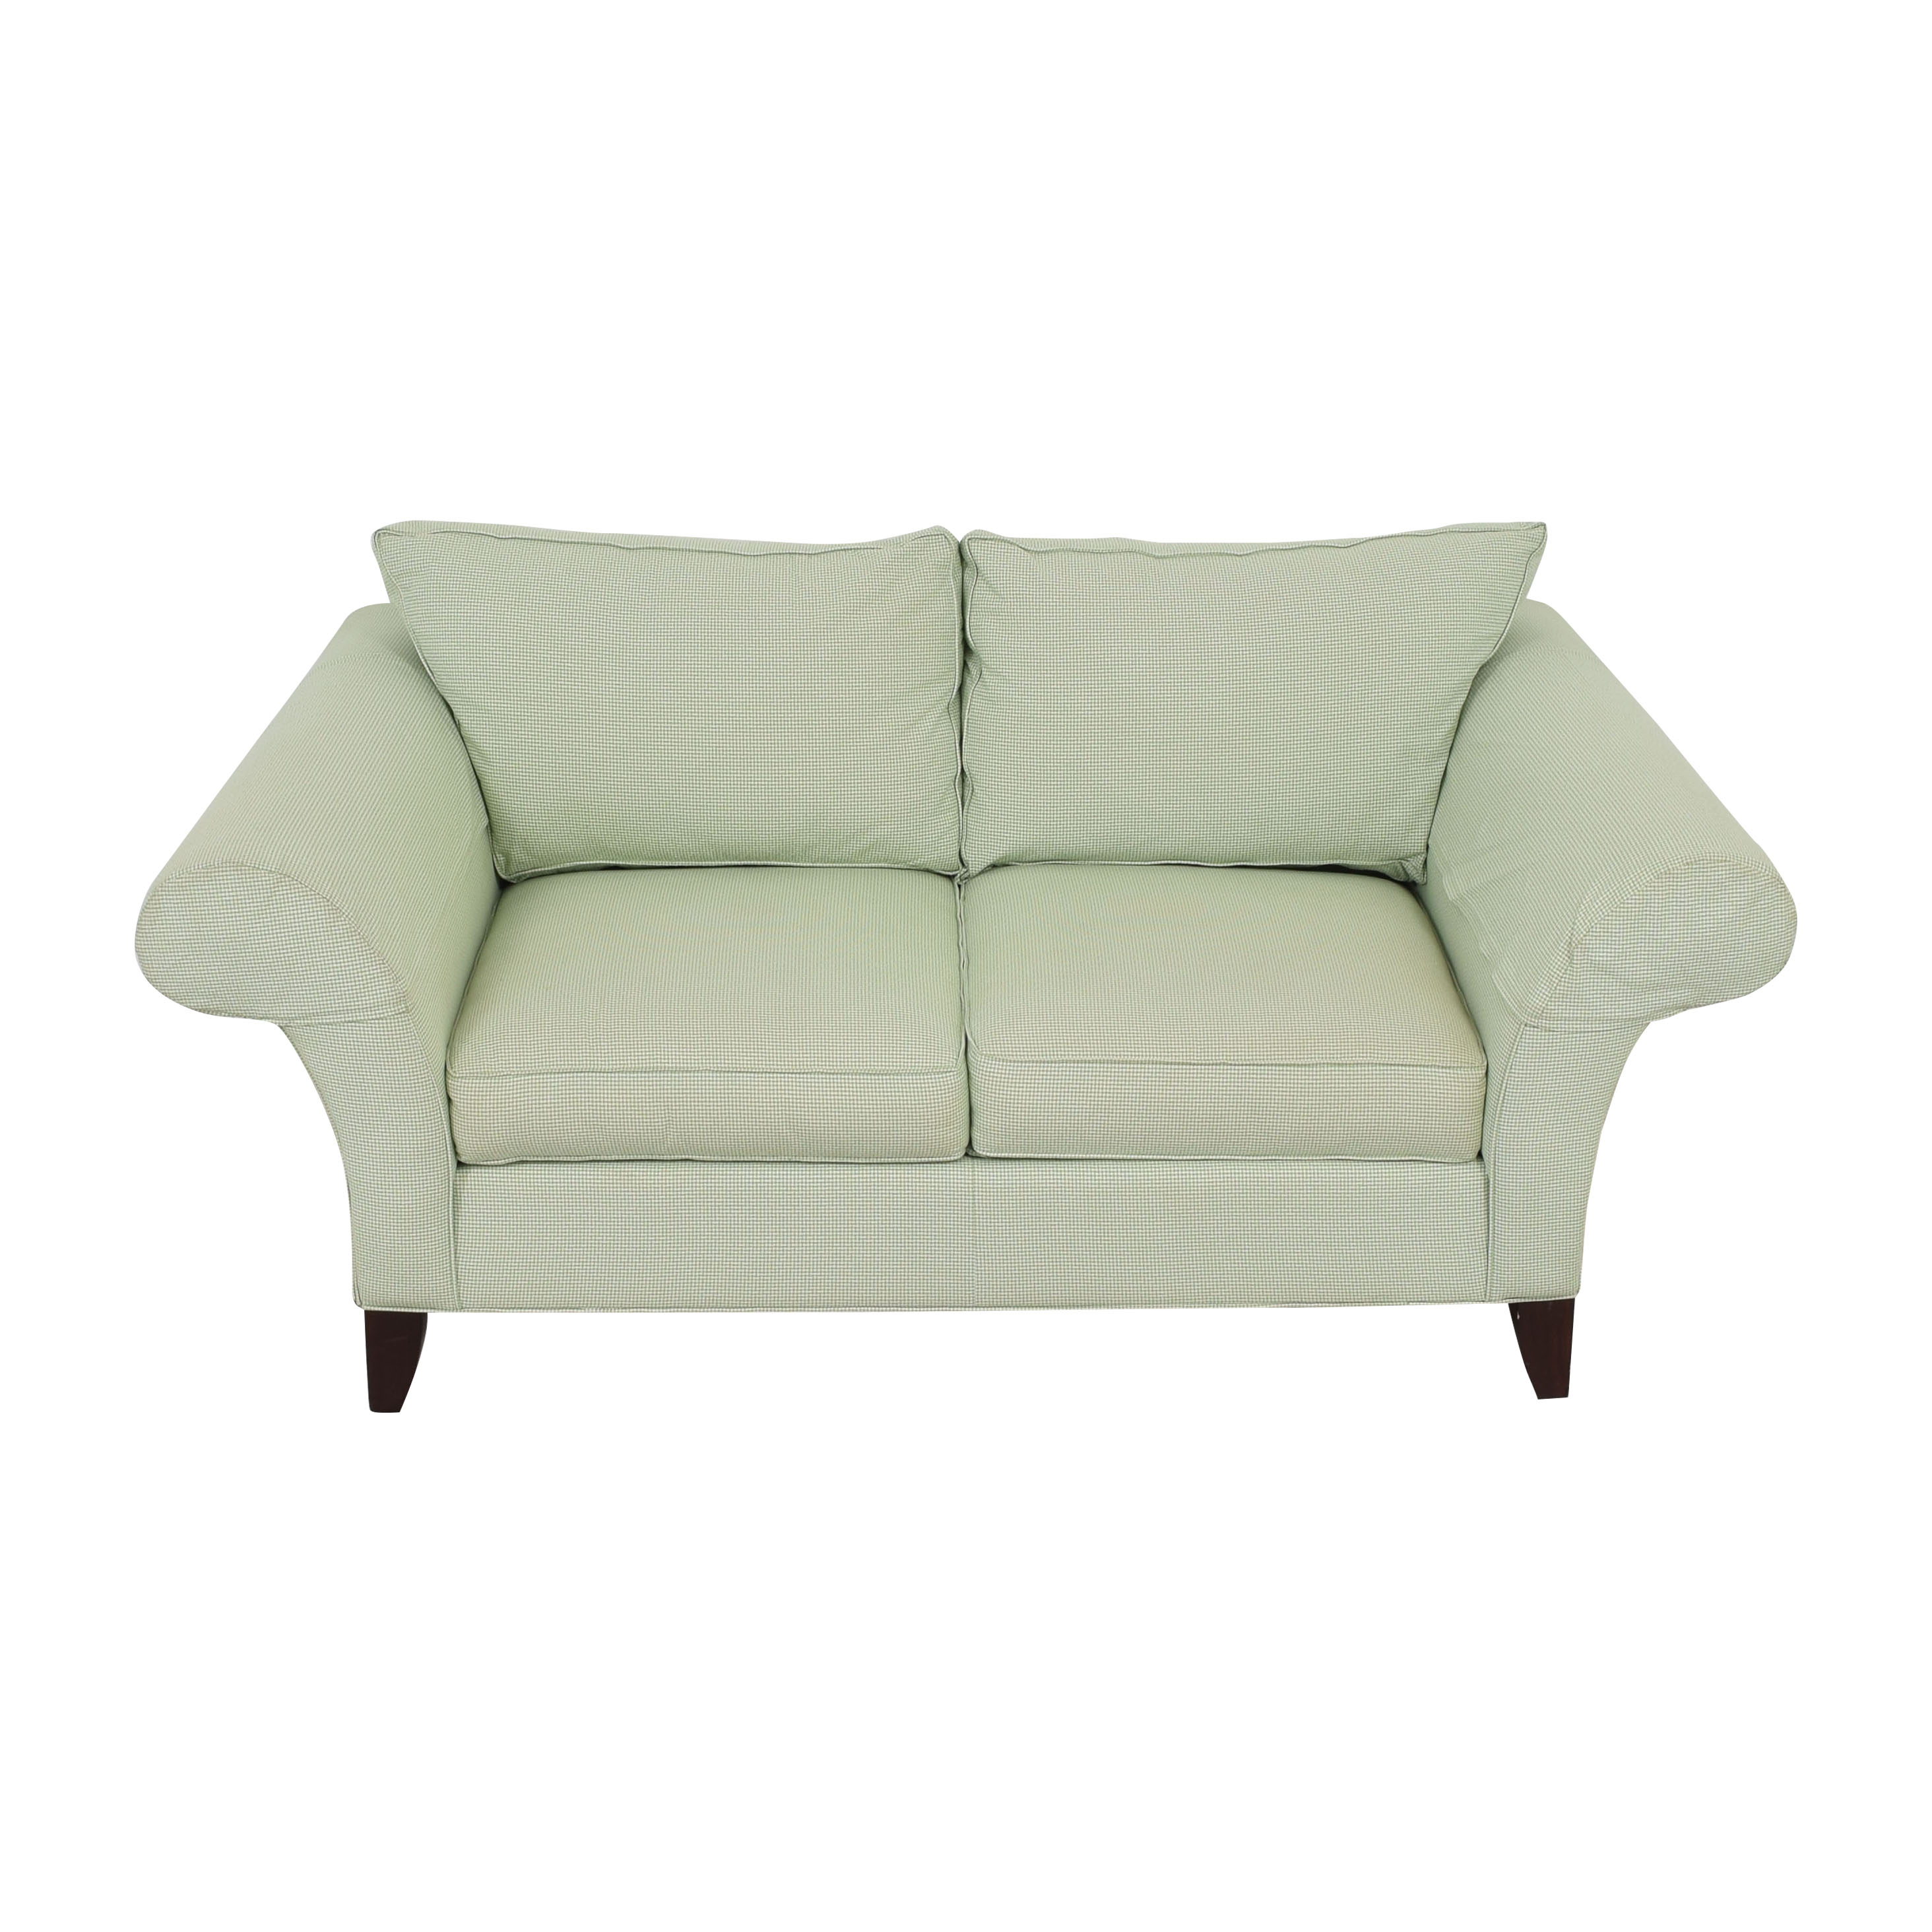 shop Ethan Allen Two Cushion Loveseat Ethan Allen Loveseats